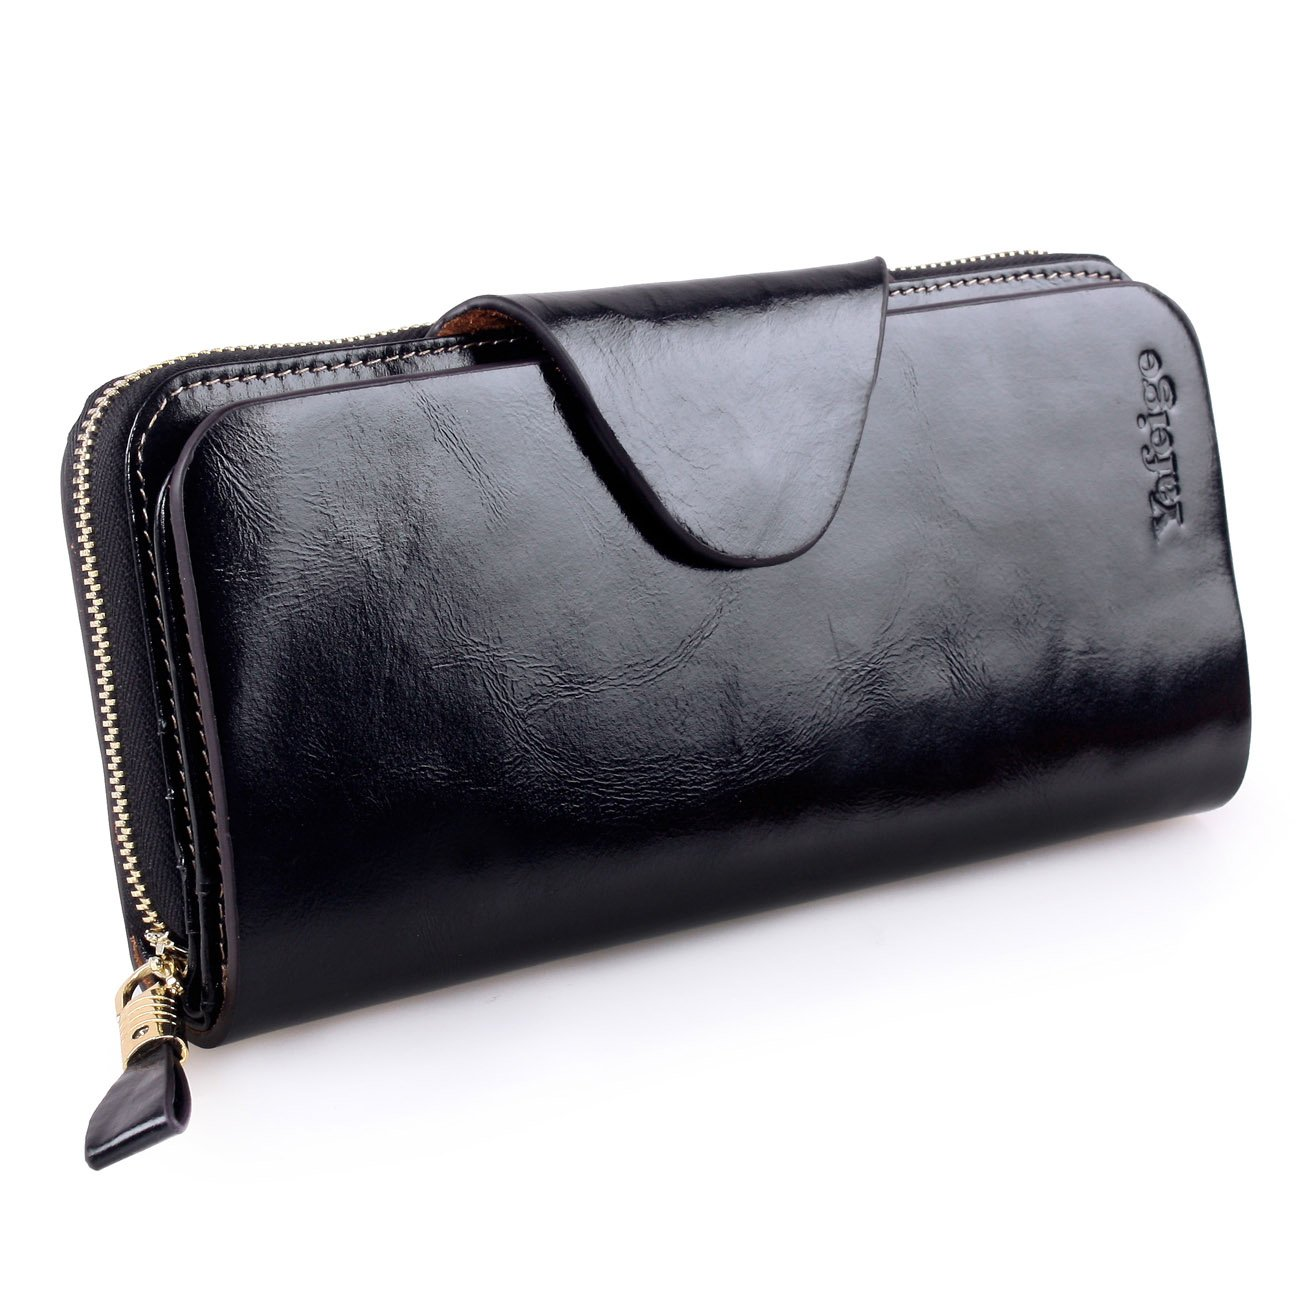 Yafeige Large Luxury Women's RFID Blocking Tri-fold Leather Wallet Zipper Ladies Clutch Purse(1-Waxed Black) by Yafeige